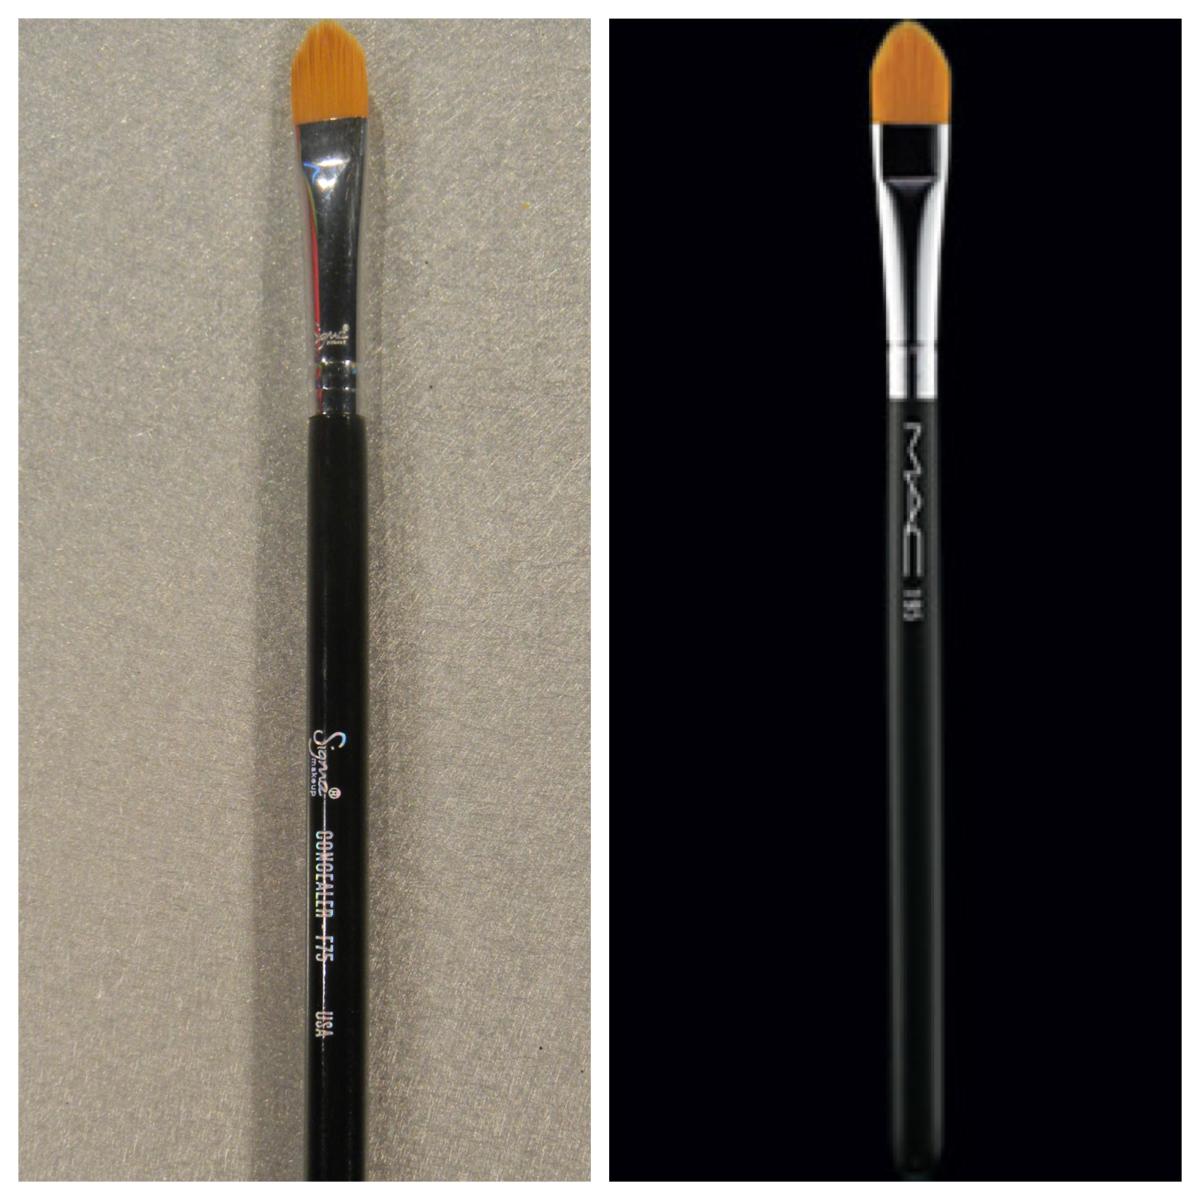 Makeup Brush Review - Talitha's Take